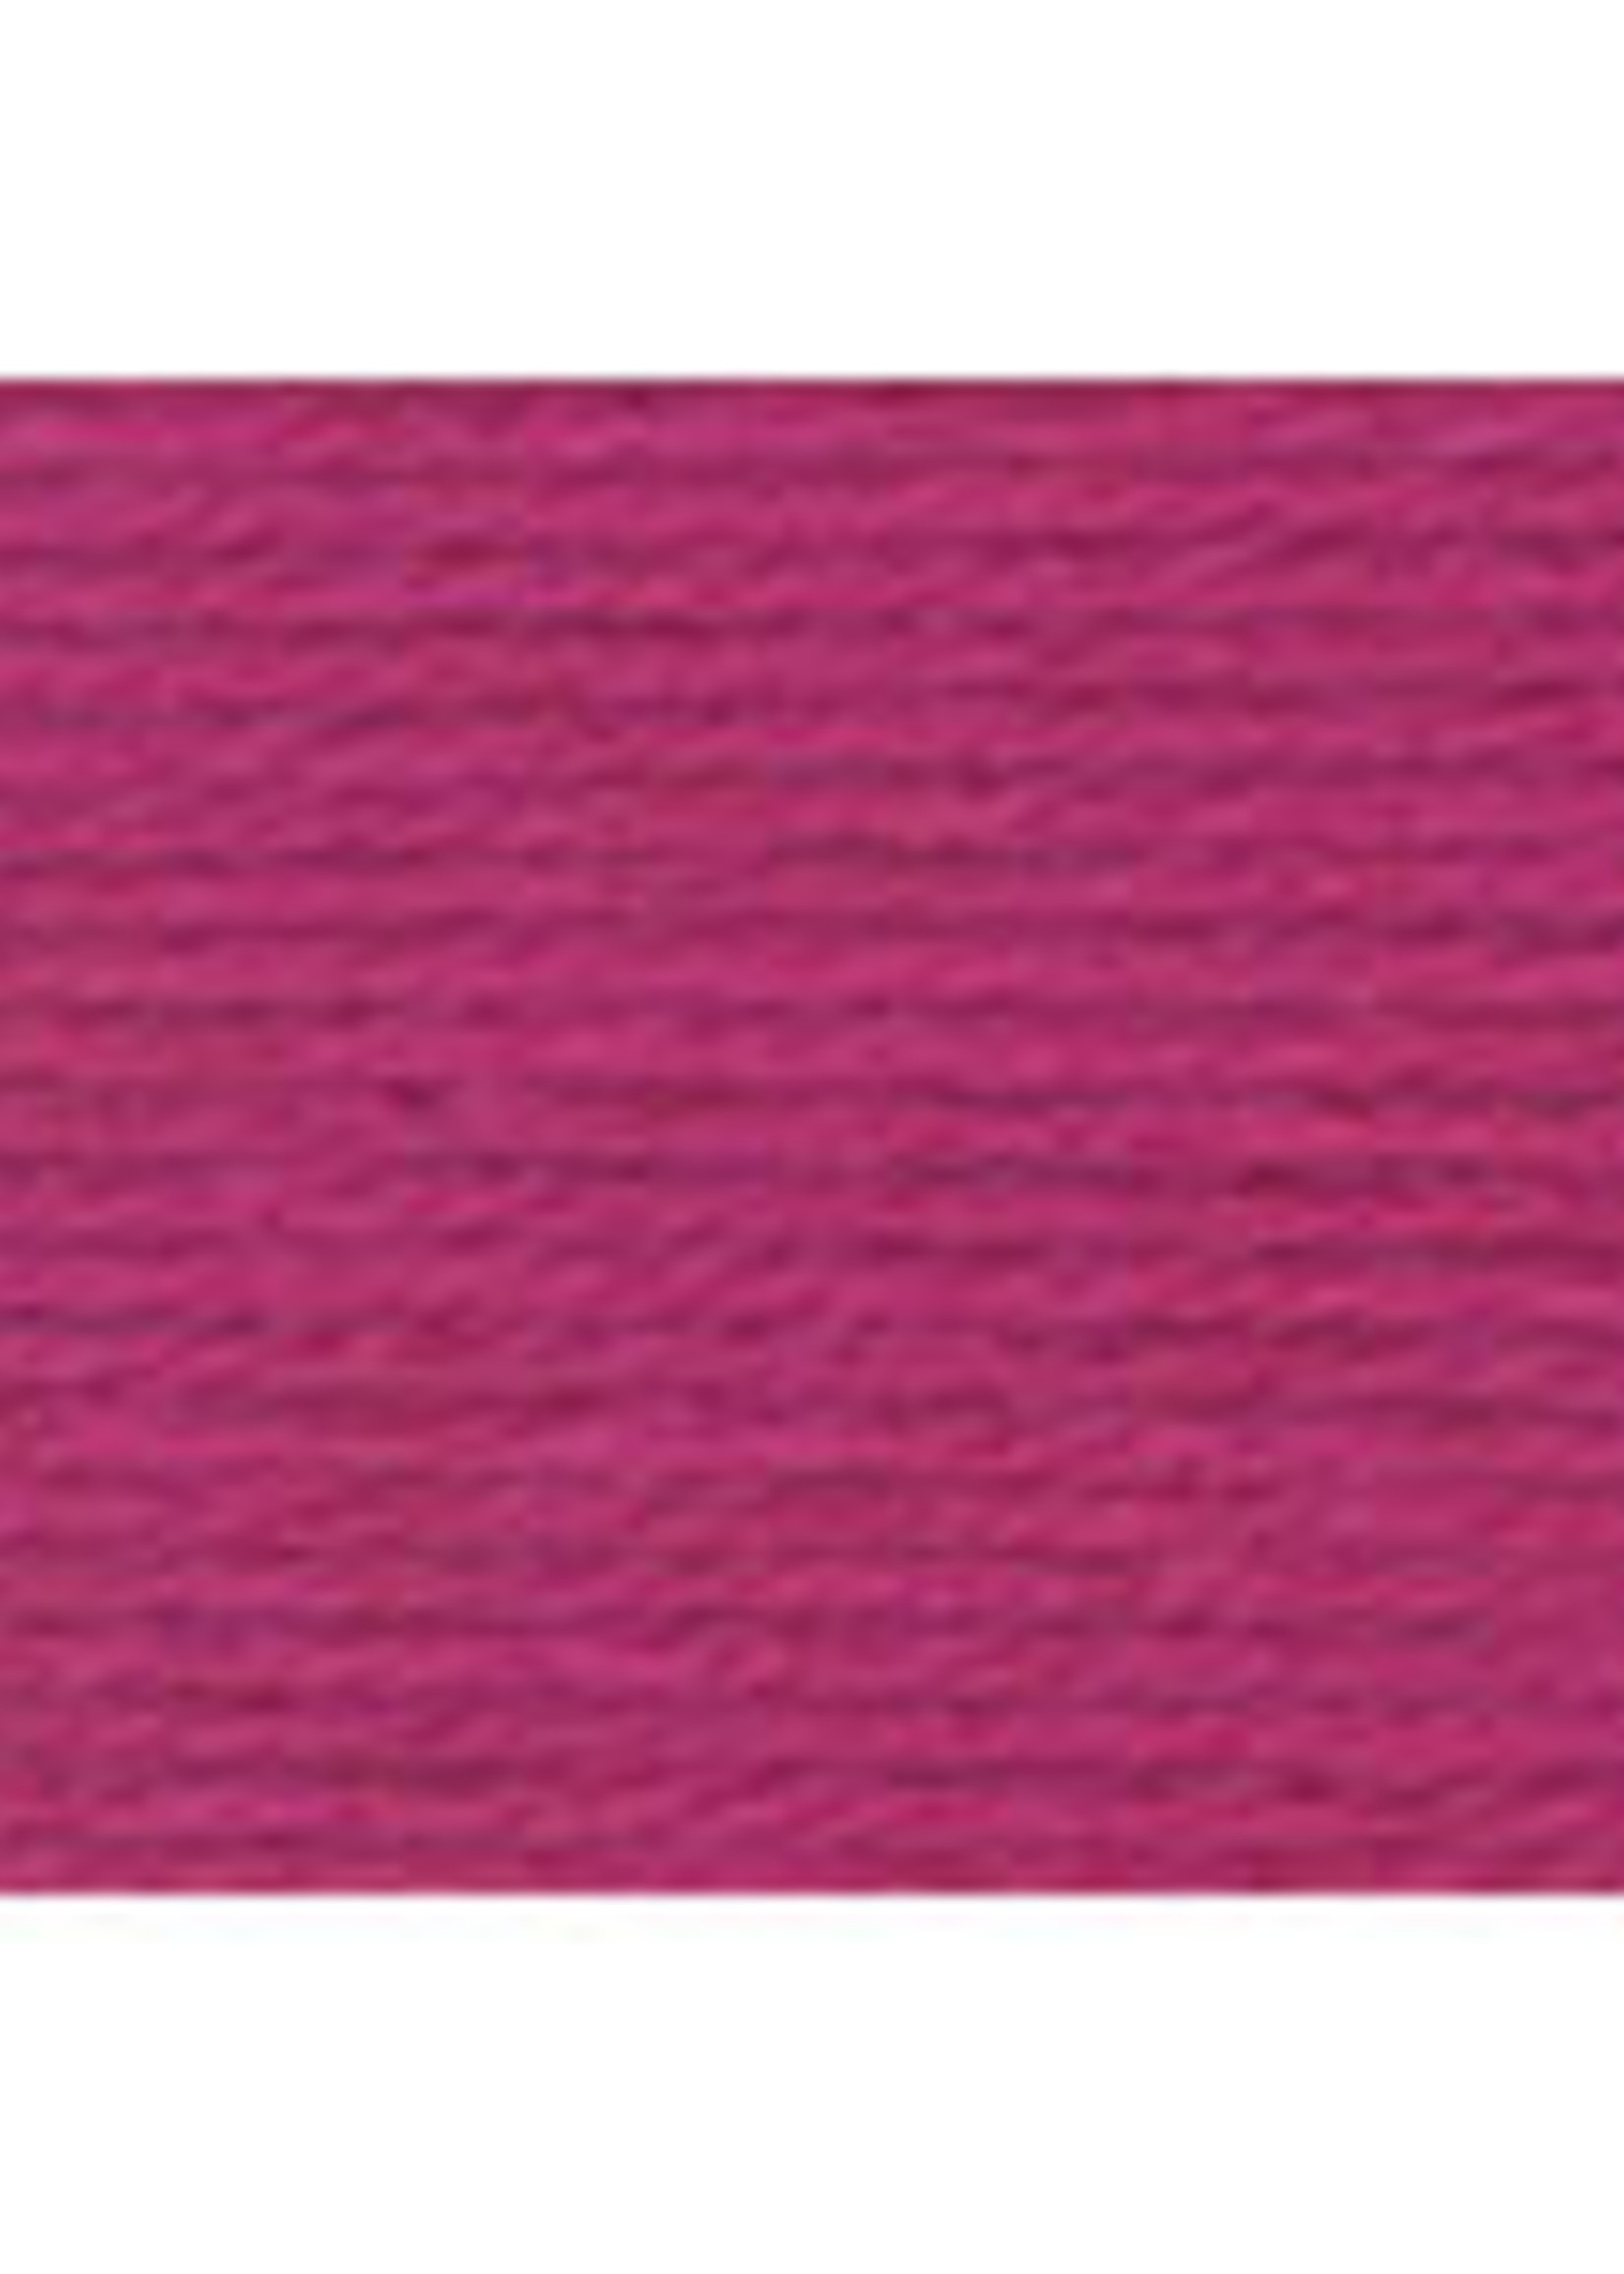 Universal Yarns Universal Yarn Uptown DK 104 Bashful